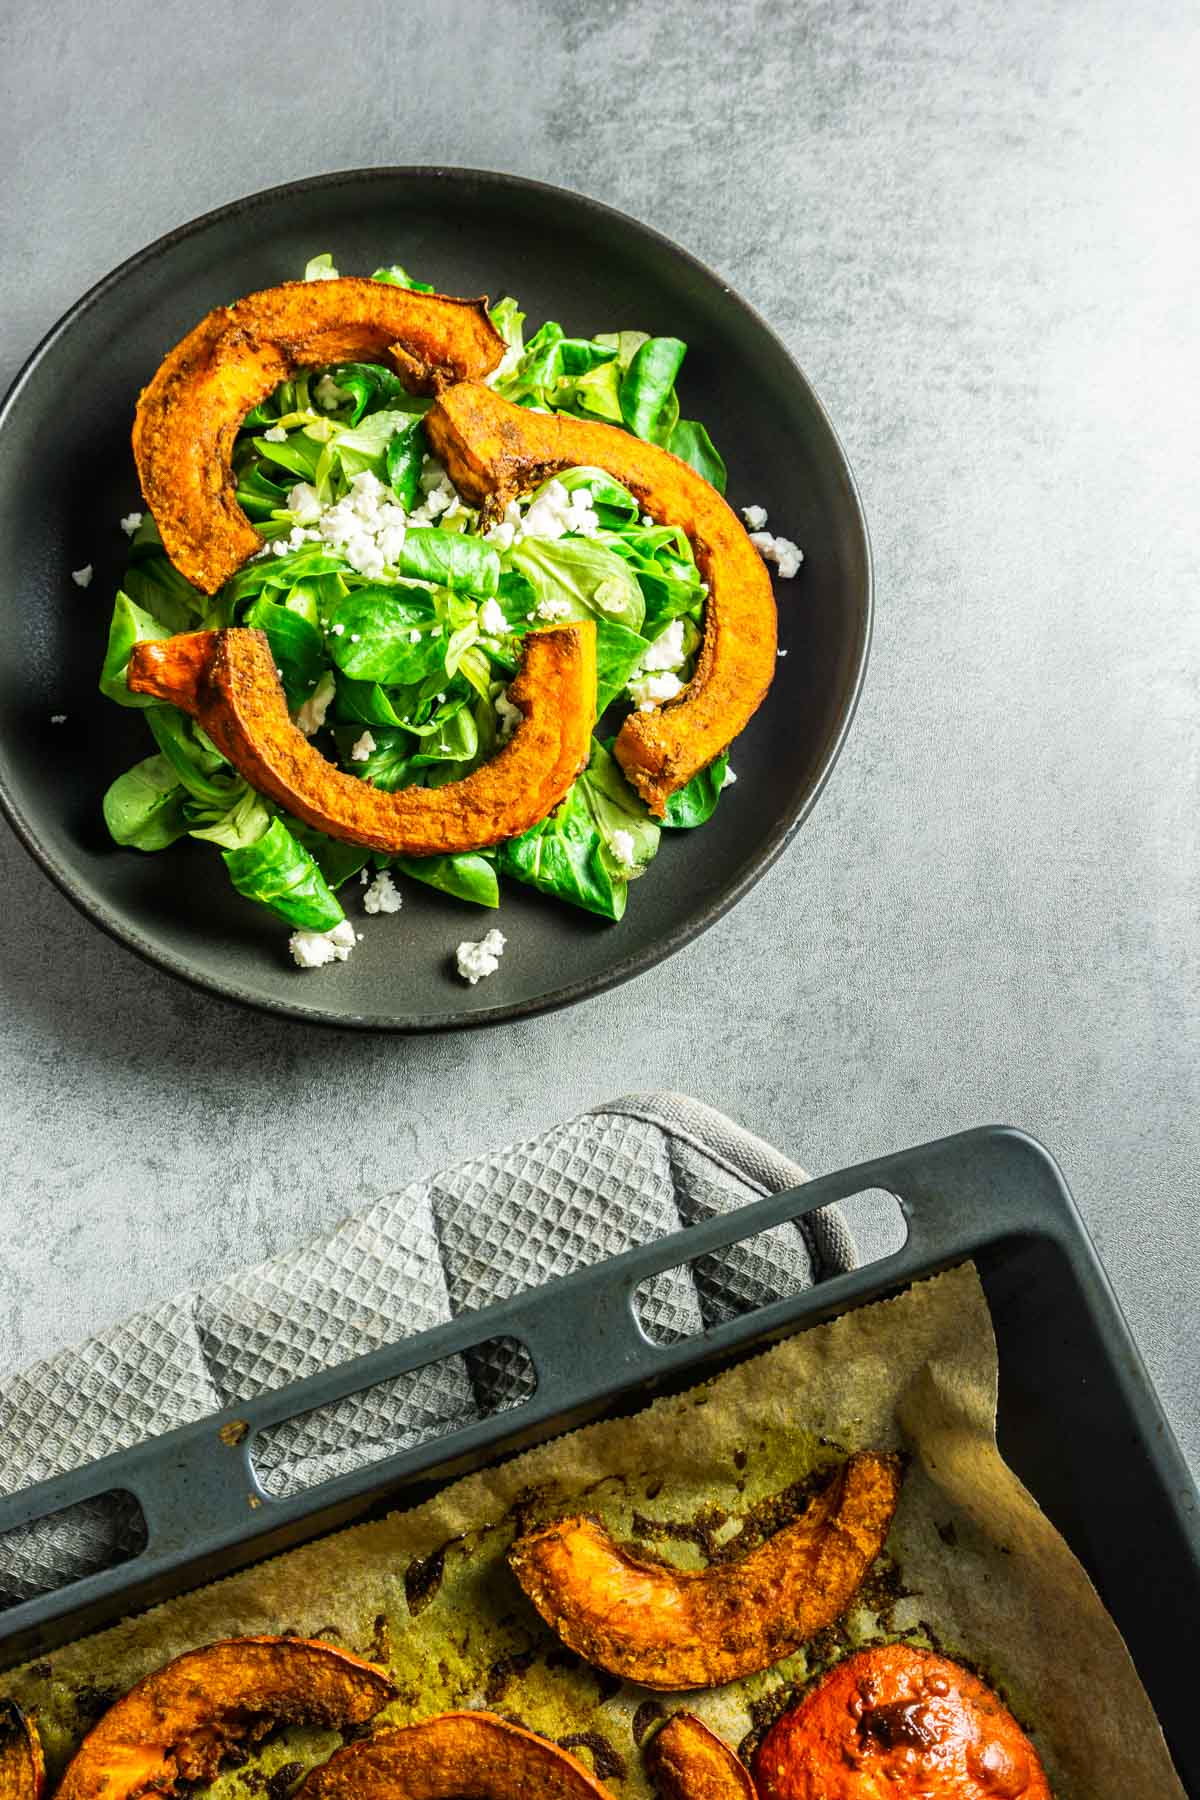 Baked spiced pumpkin on lambs lettuce with feta